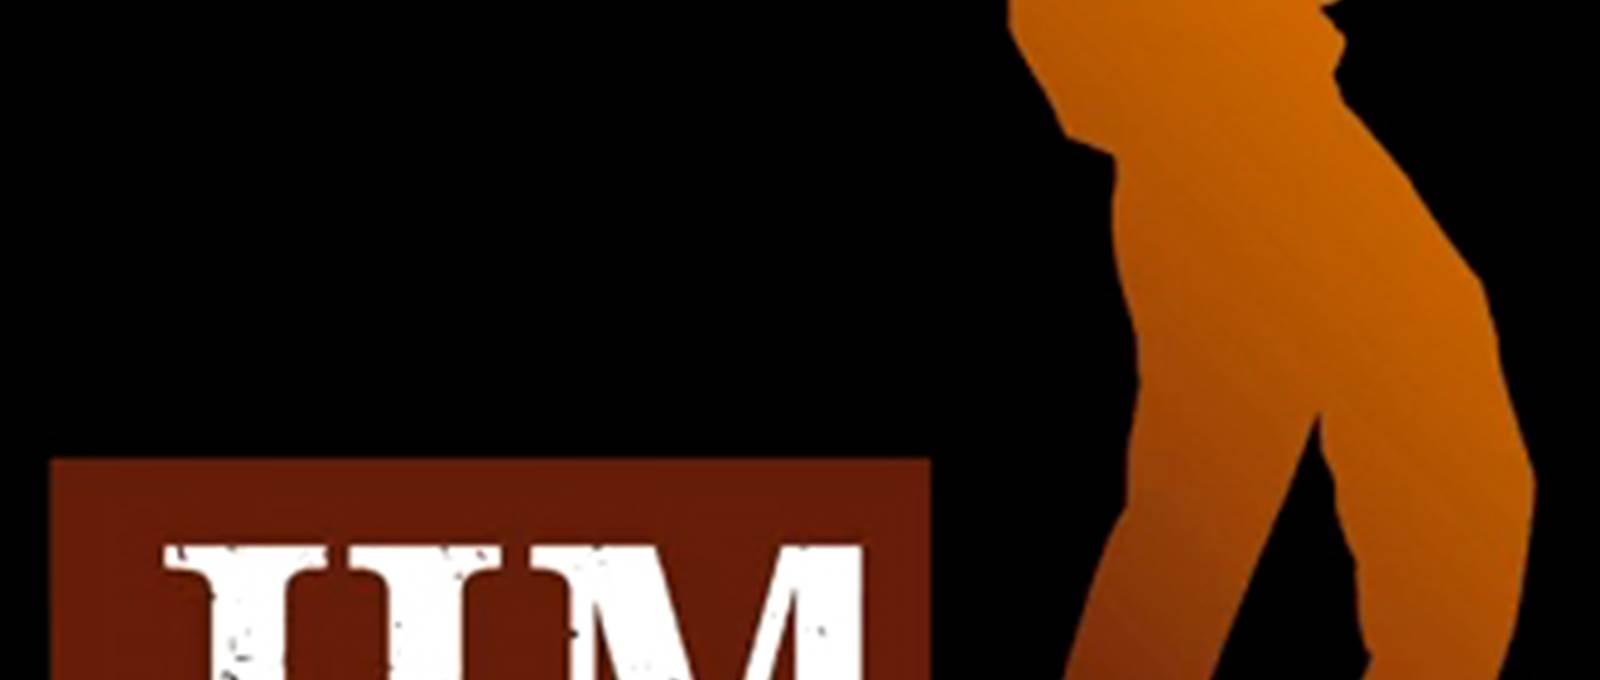 logo-jim